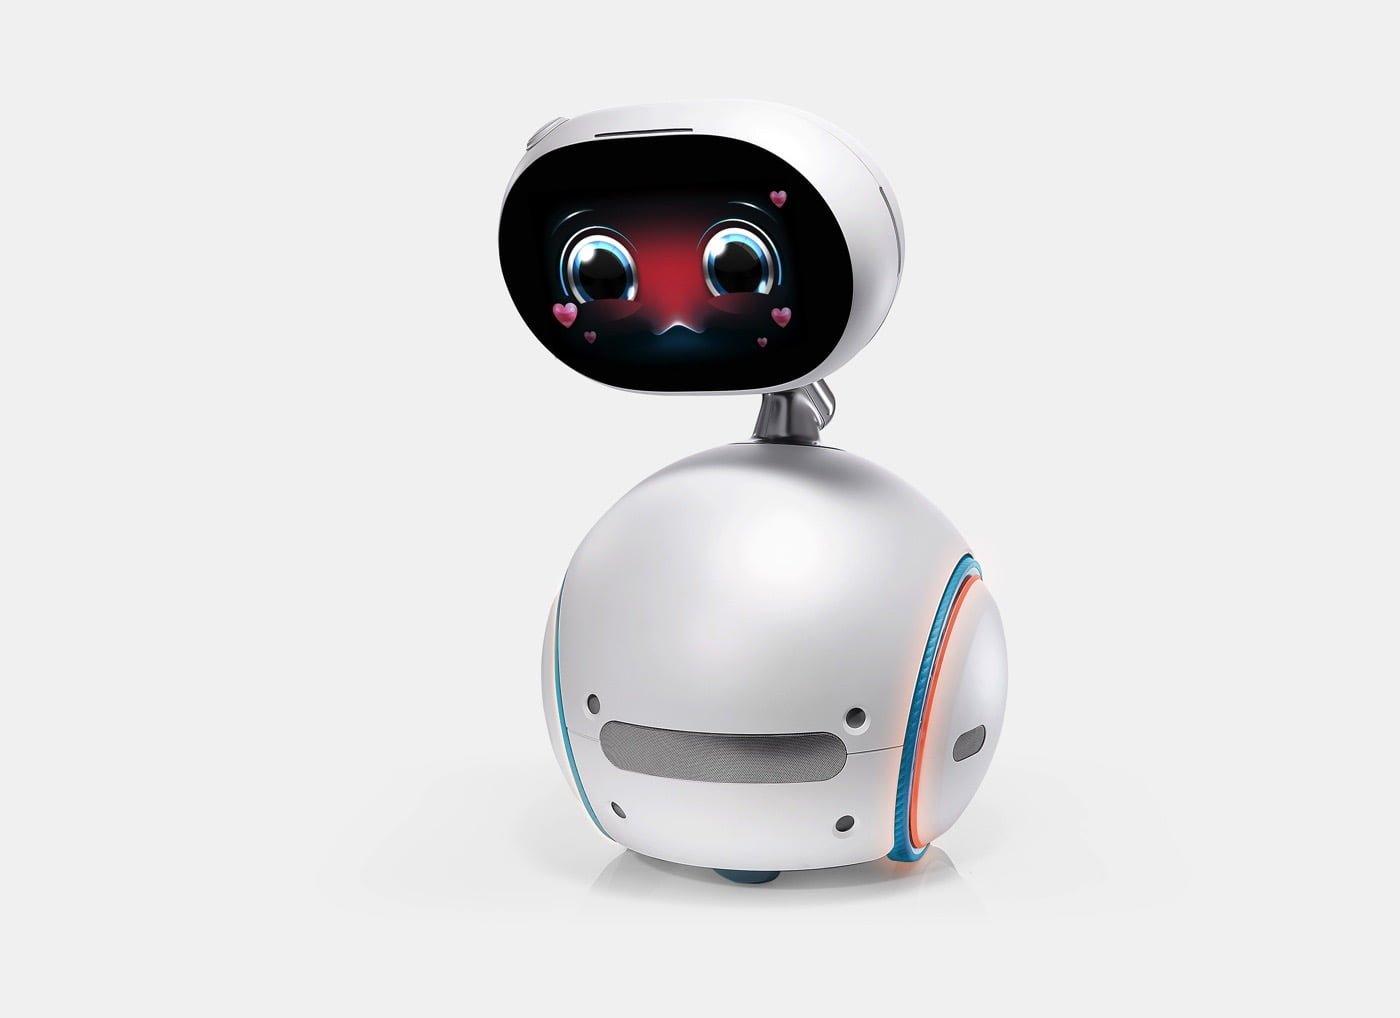 Asus Zenbo Robot White